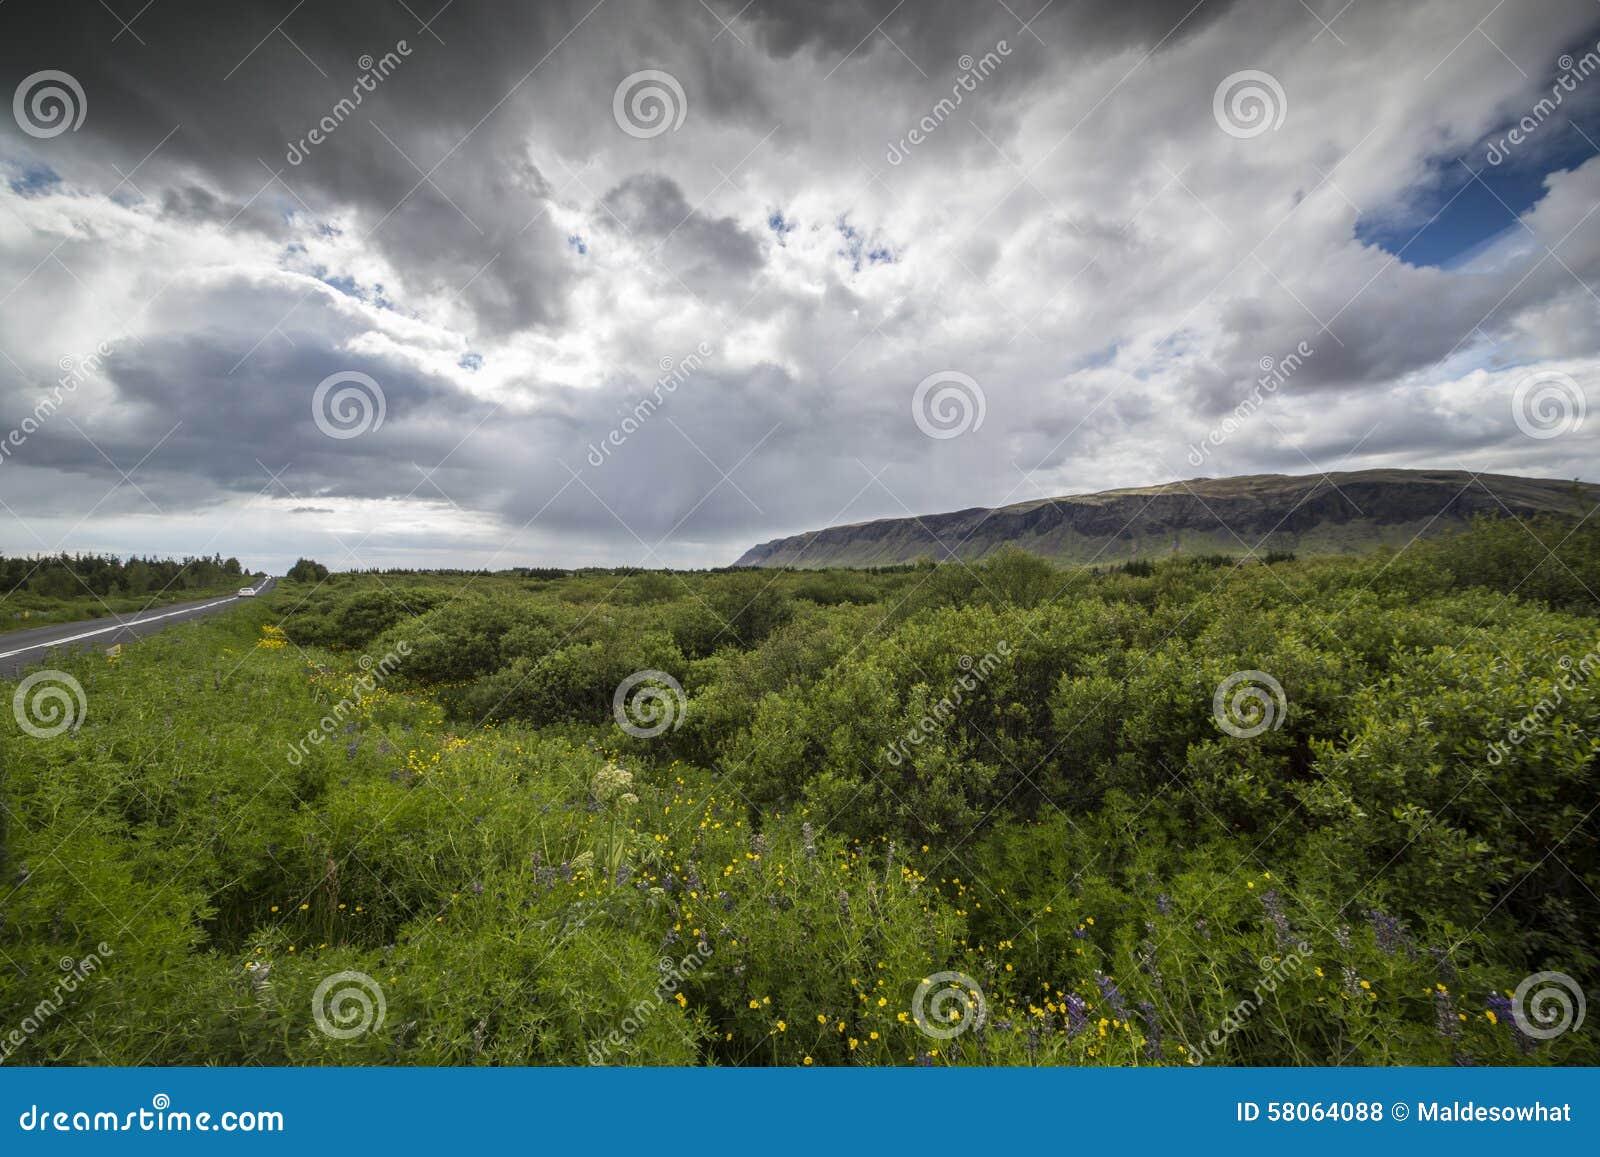 Mountain and rain clouds Rain